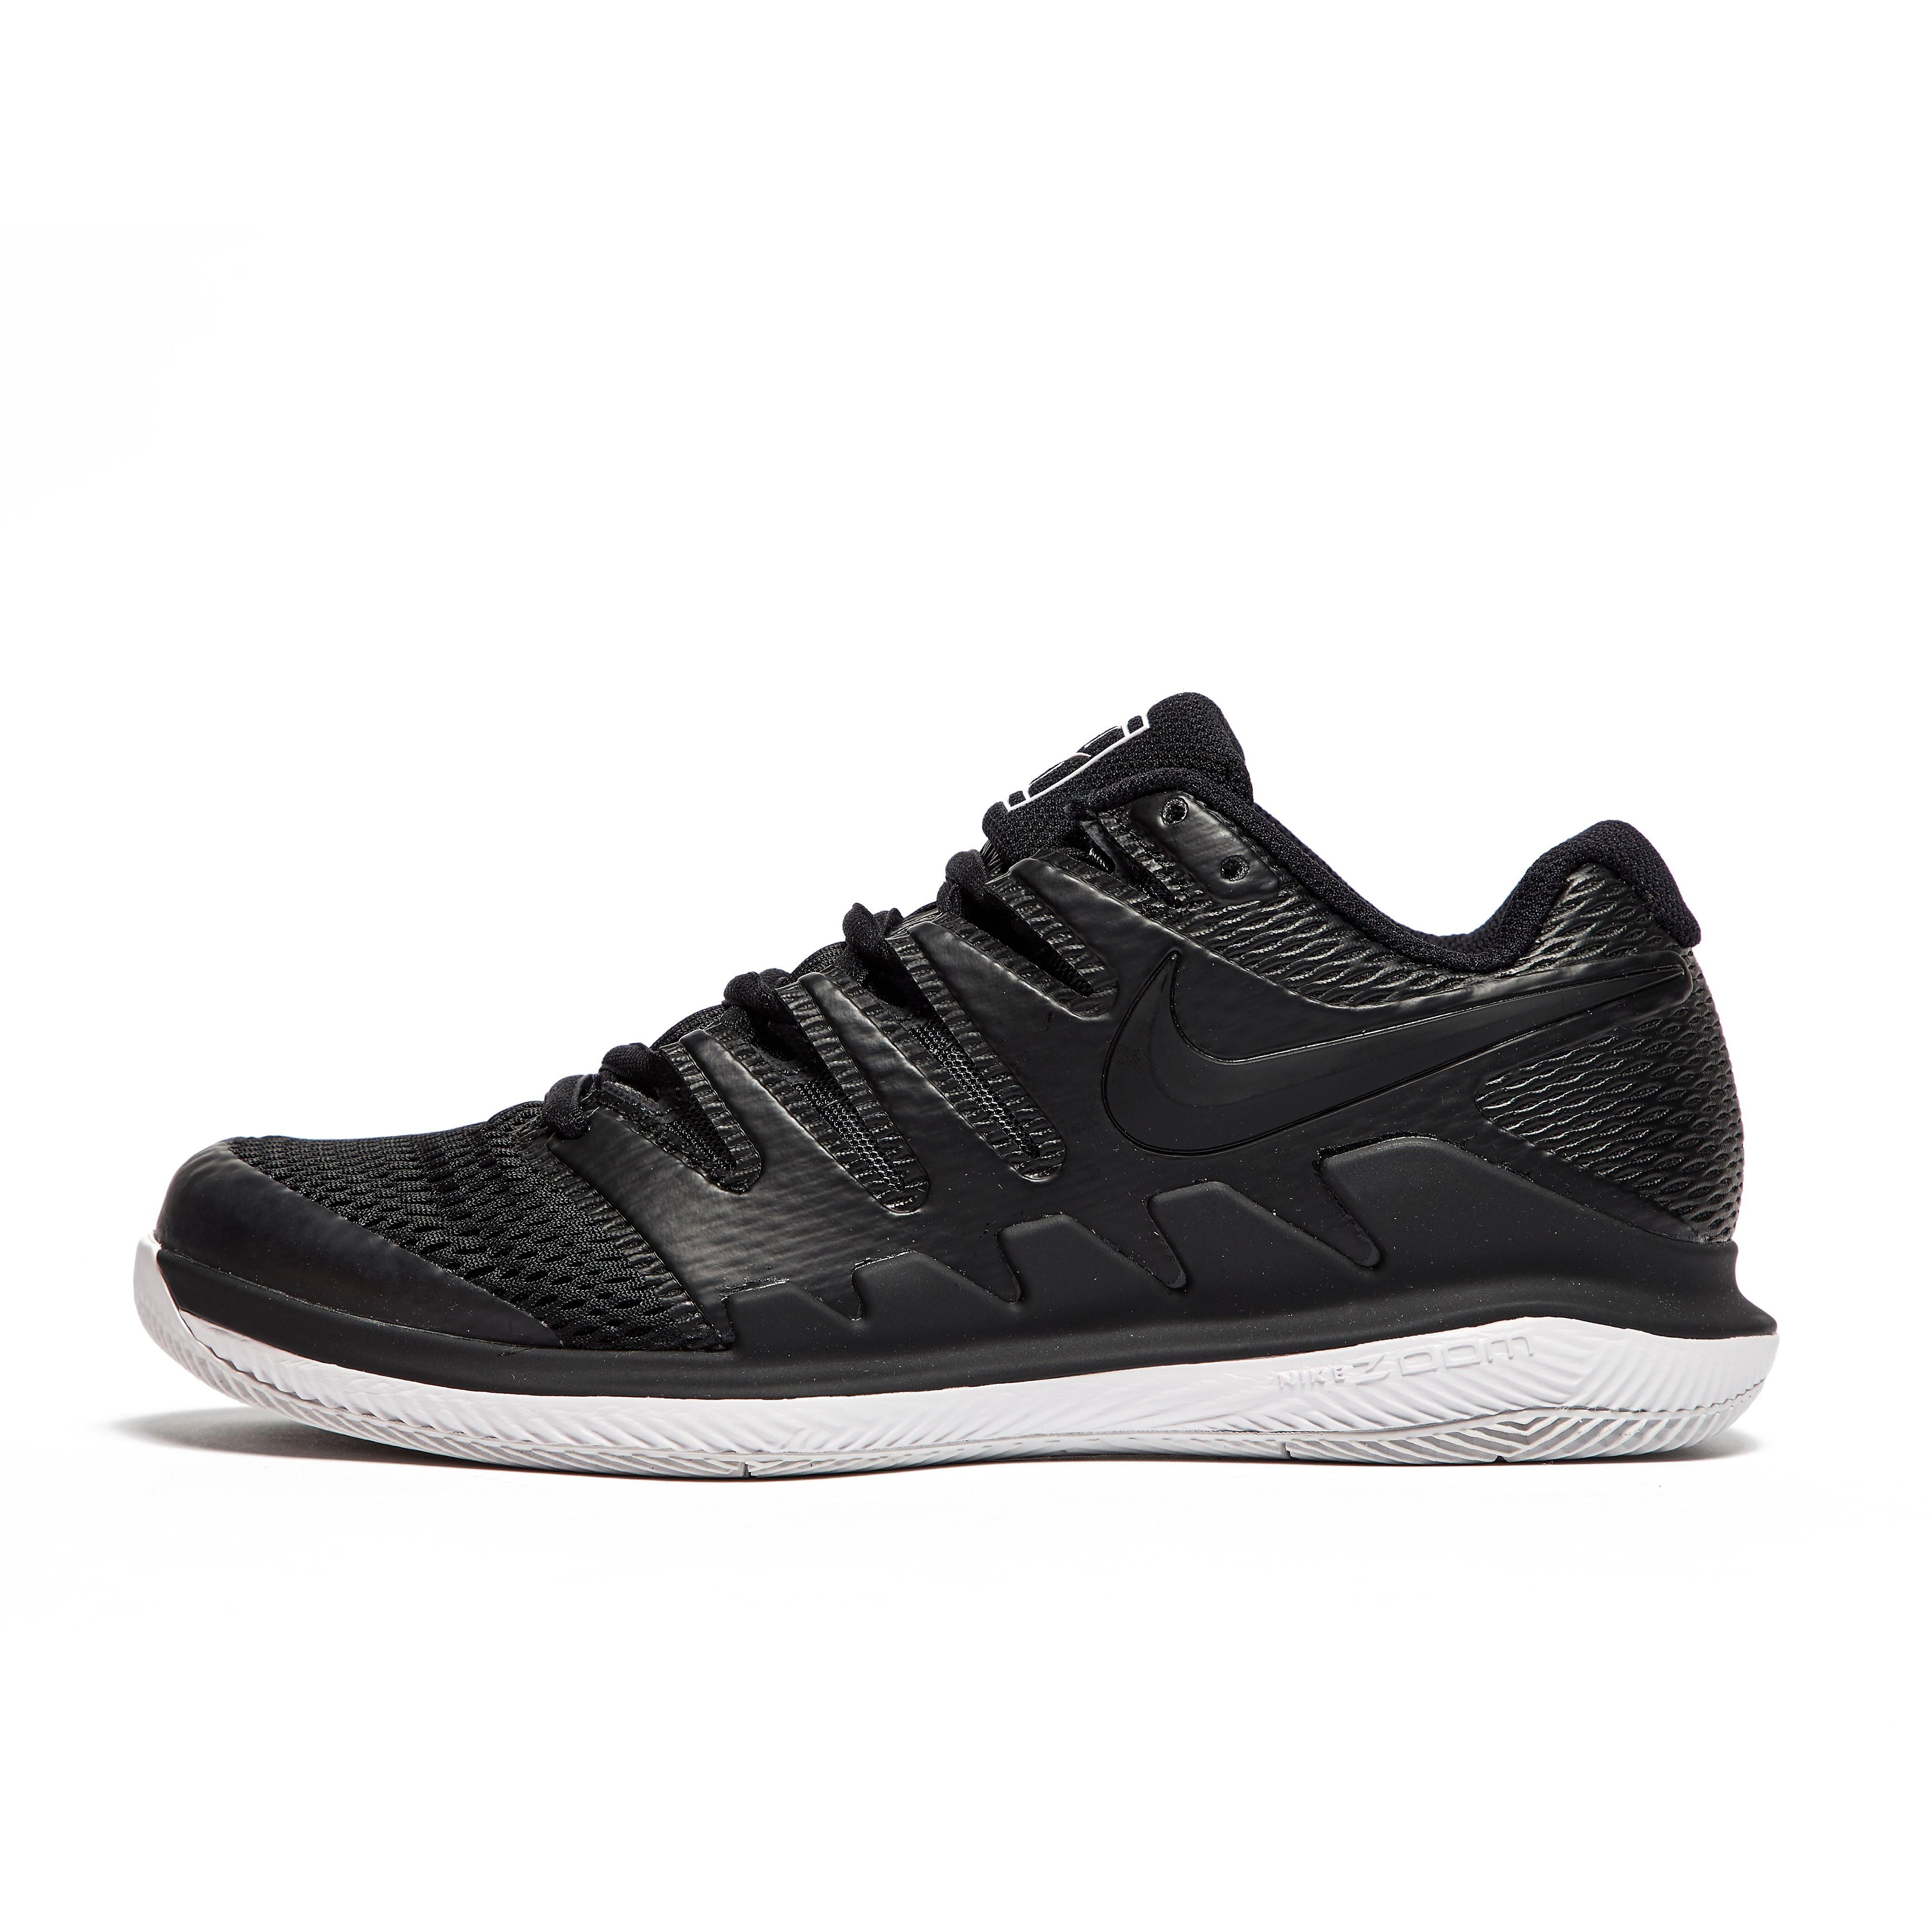 Nike Air Zoom Vapor X HC Junior Tennis Shoes